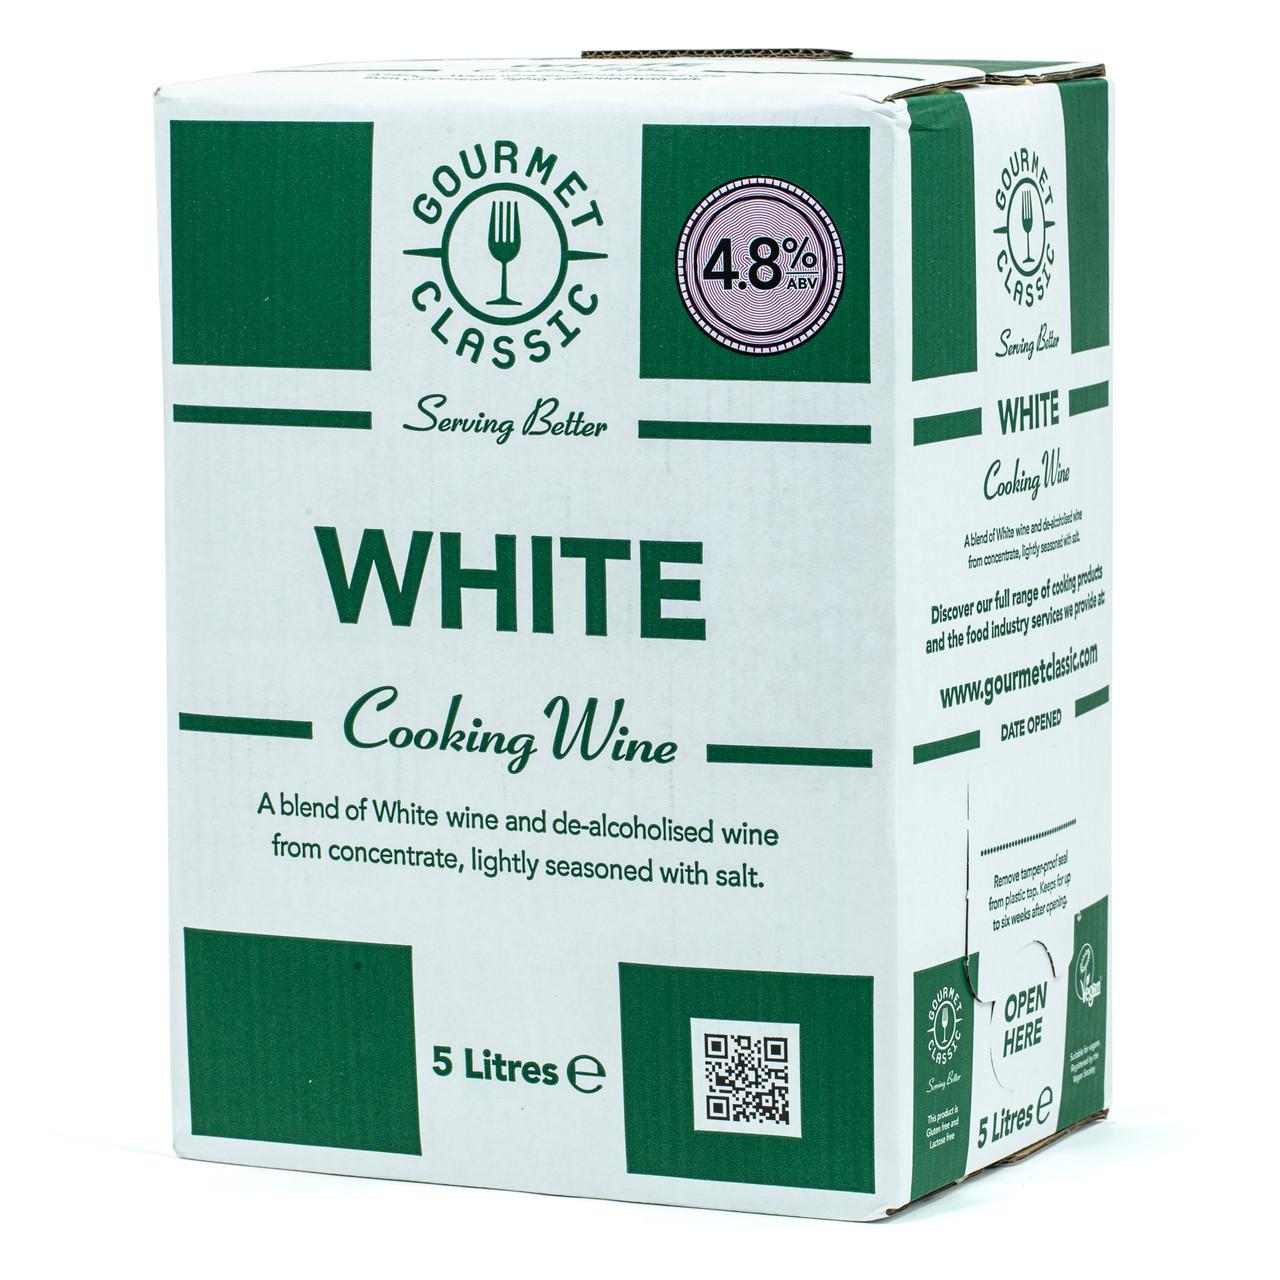 Gourmet Classic Italian White Wine 5L